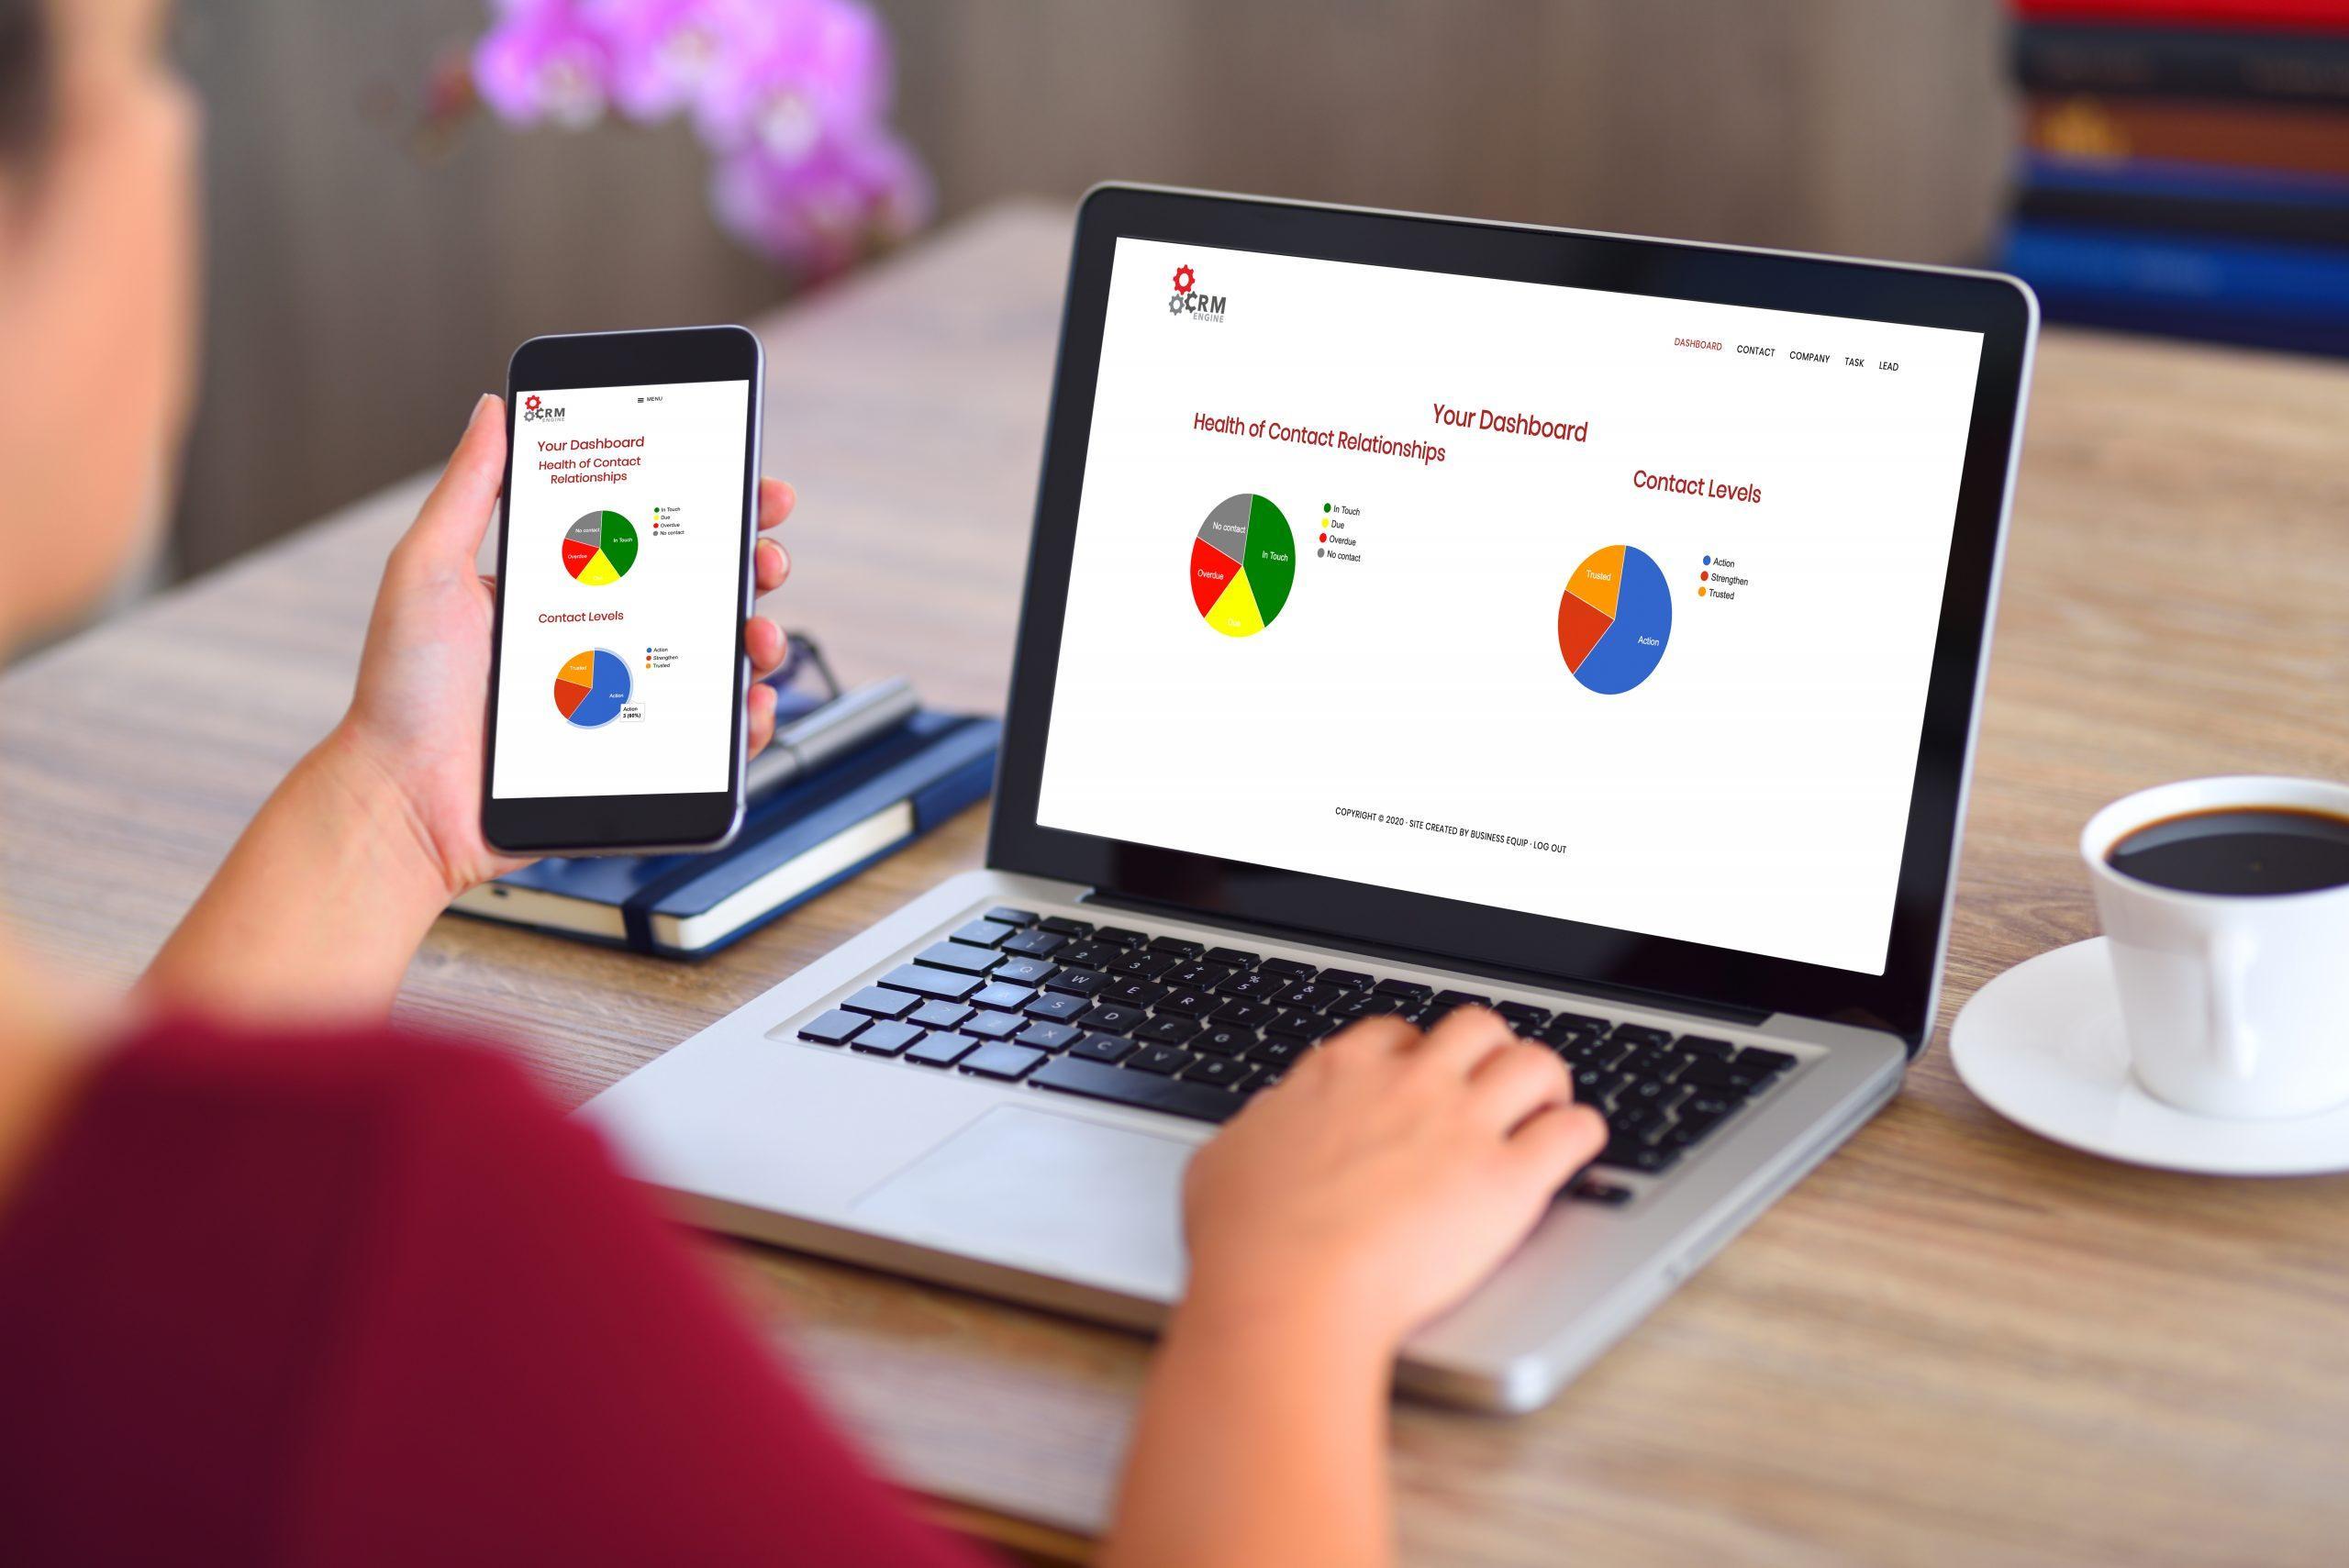 Review CRM Engine: Bespoke Customer Management System - appvizer